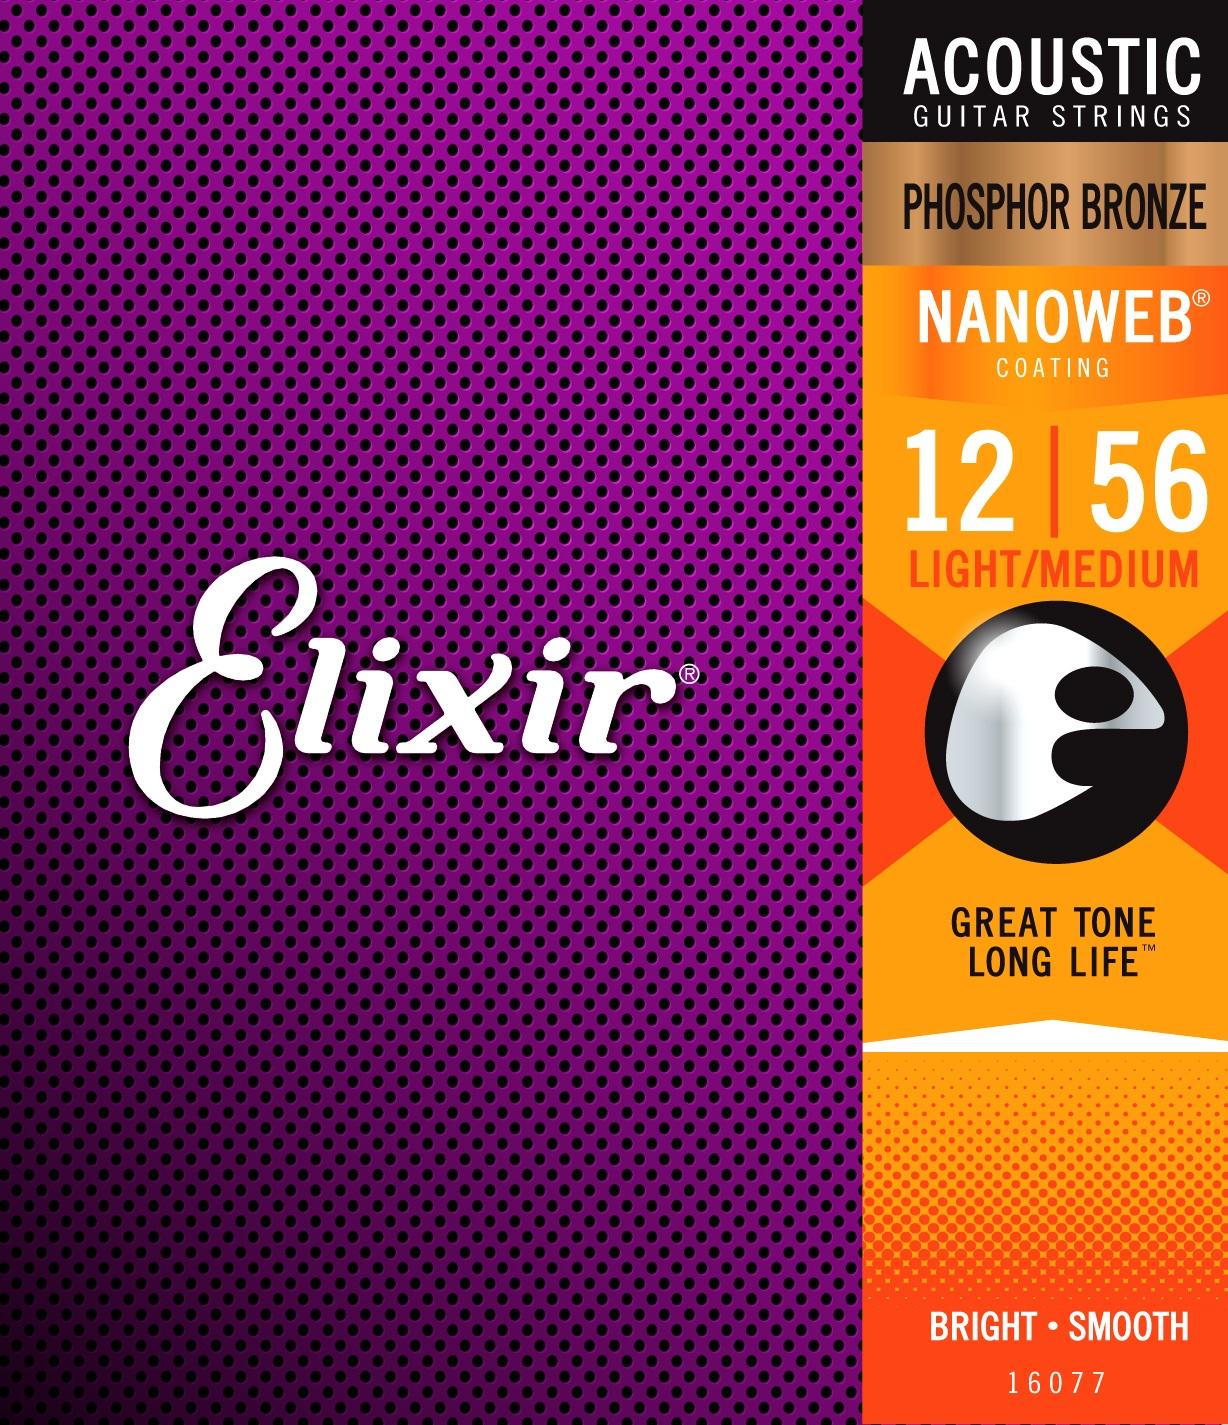 Elixir Nanoweb Phosphor Bronze Light-Medium